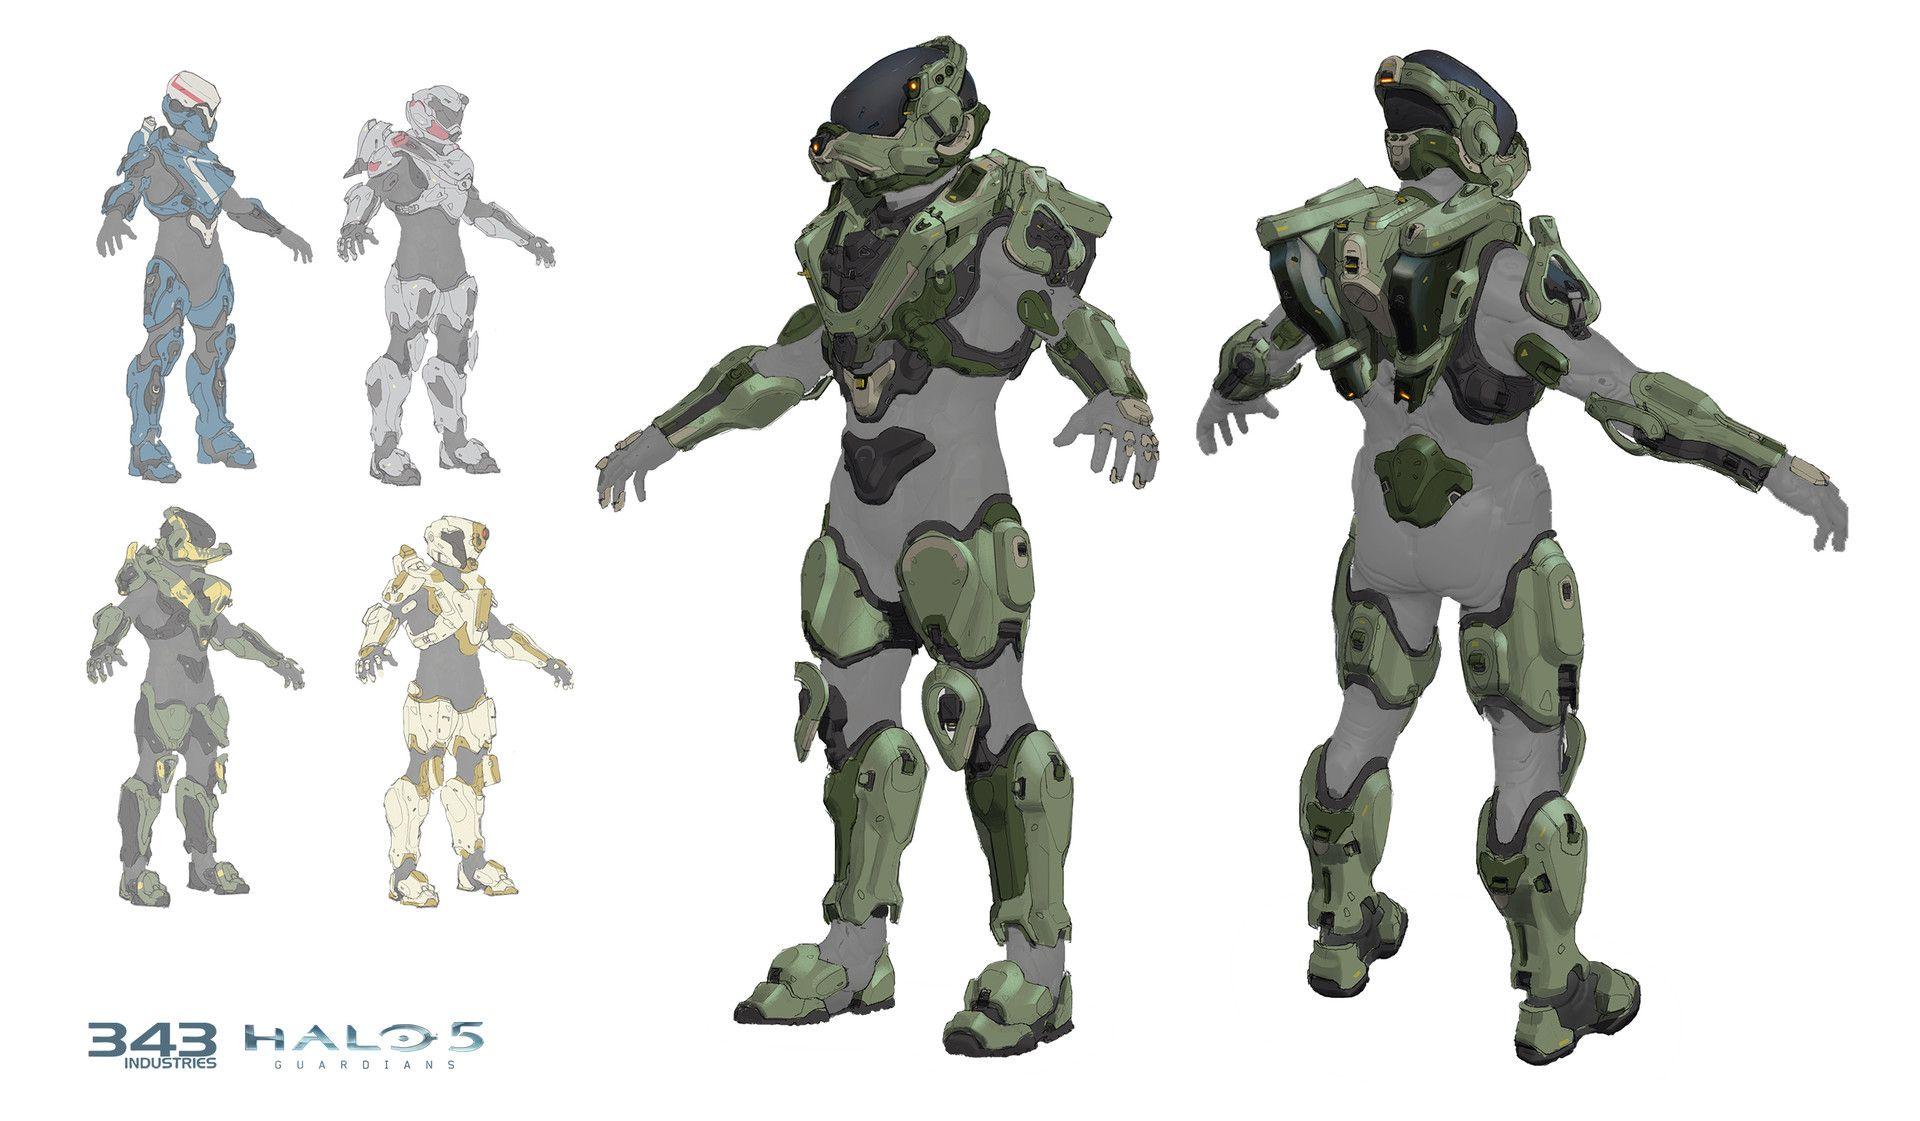 ArtStation - Halo 5: Guardians, Mako Armor Concept, David Heidhoff